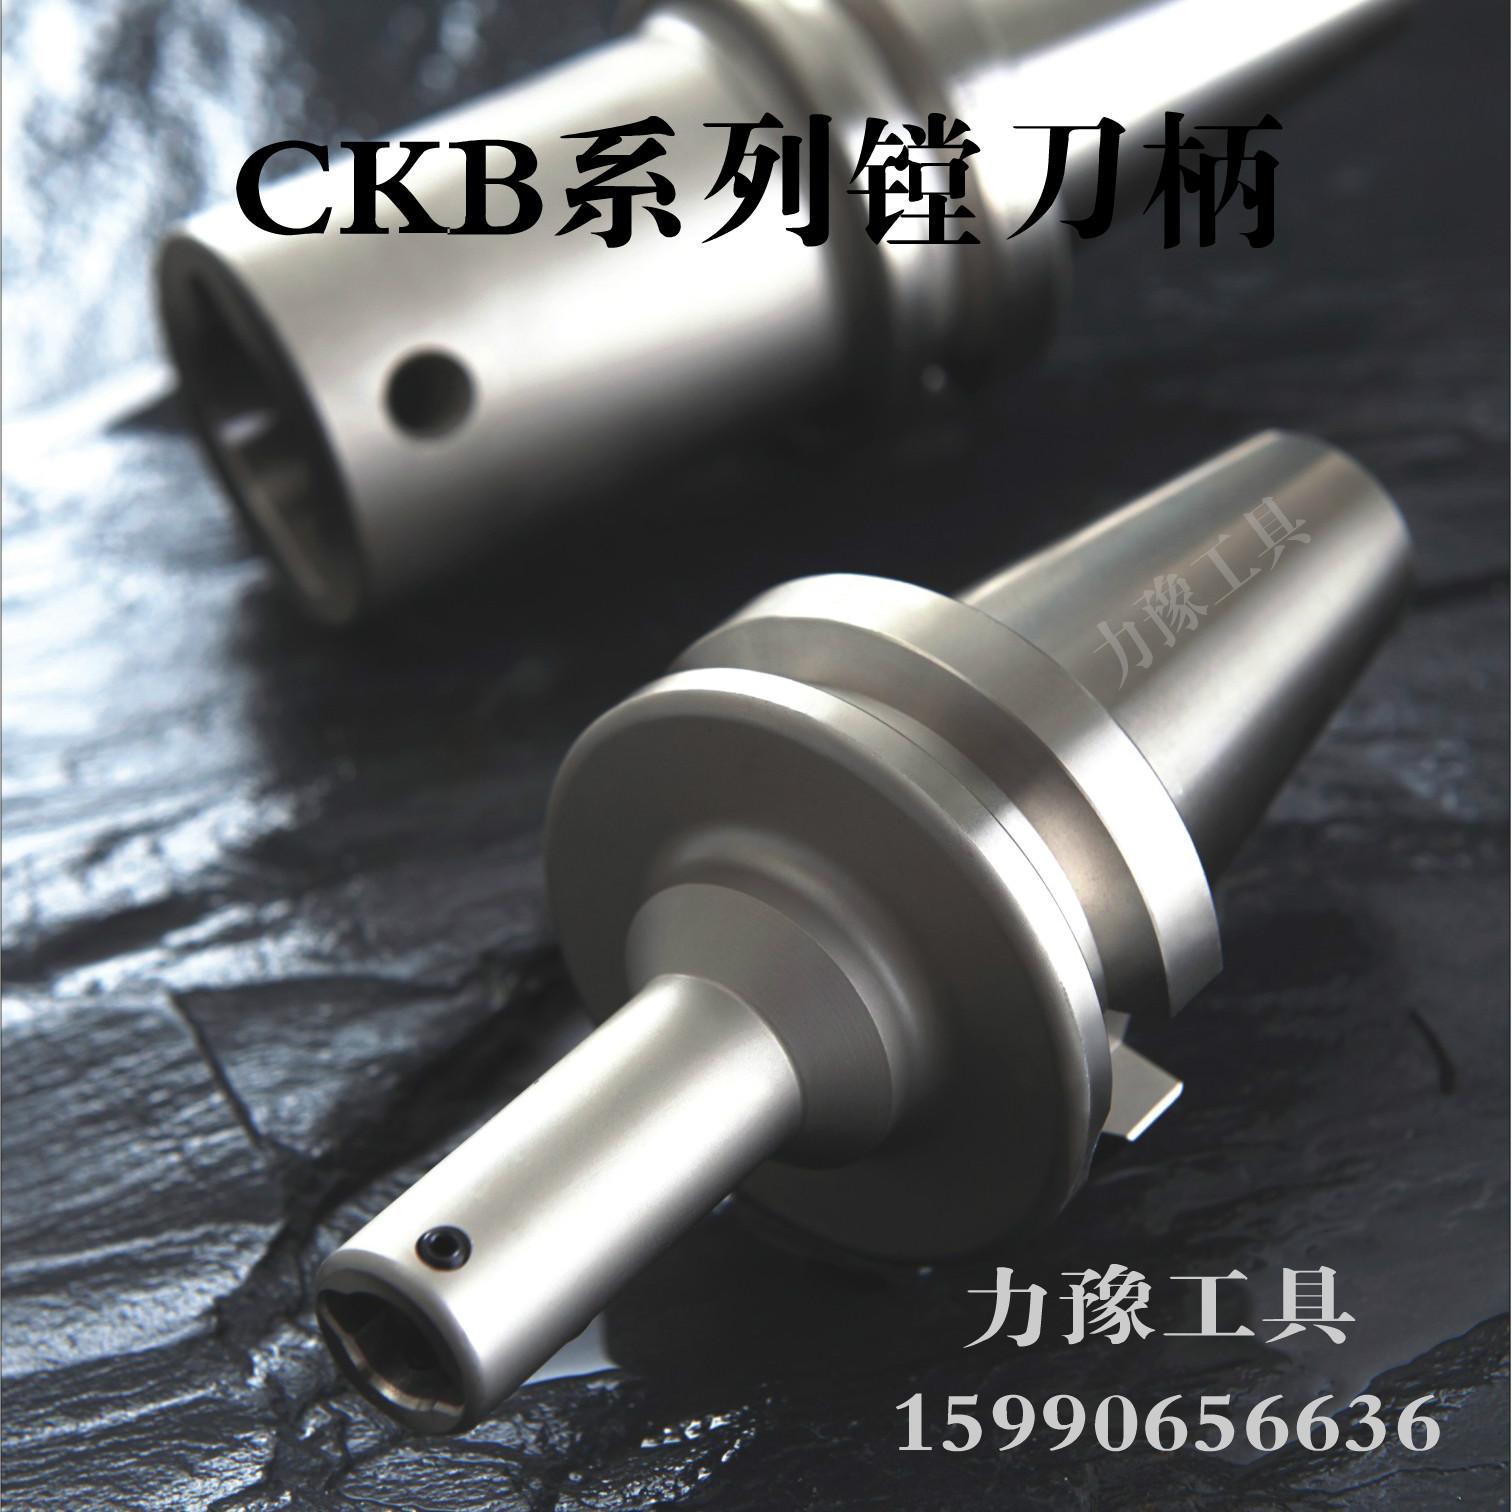 BT40镗刀柄/数控粗镗/精镗刀柄/CKB接口刀柄BT40-CKB1/2/3/4/5/6